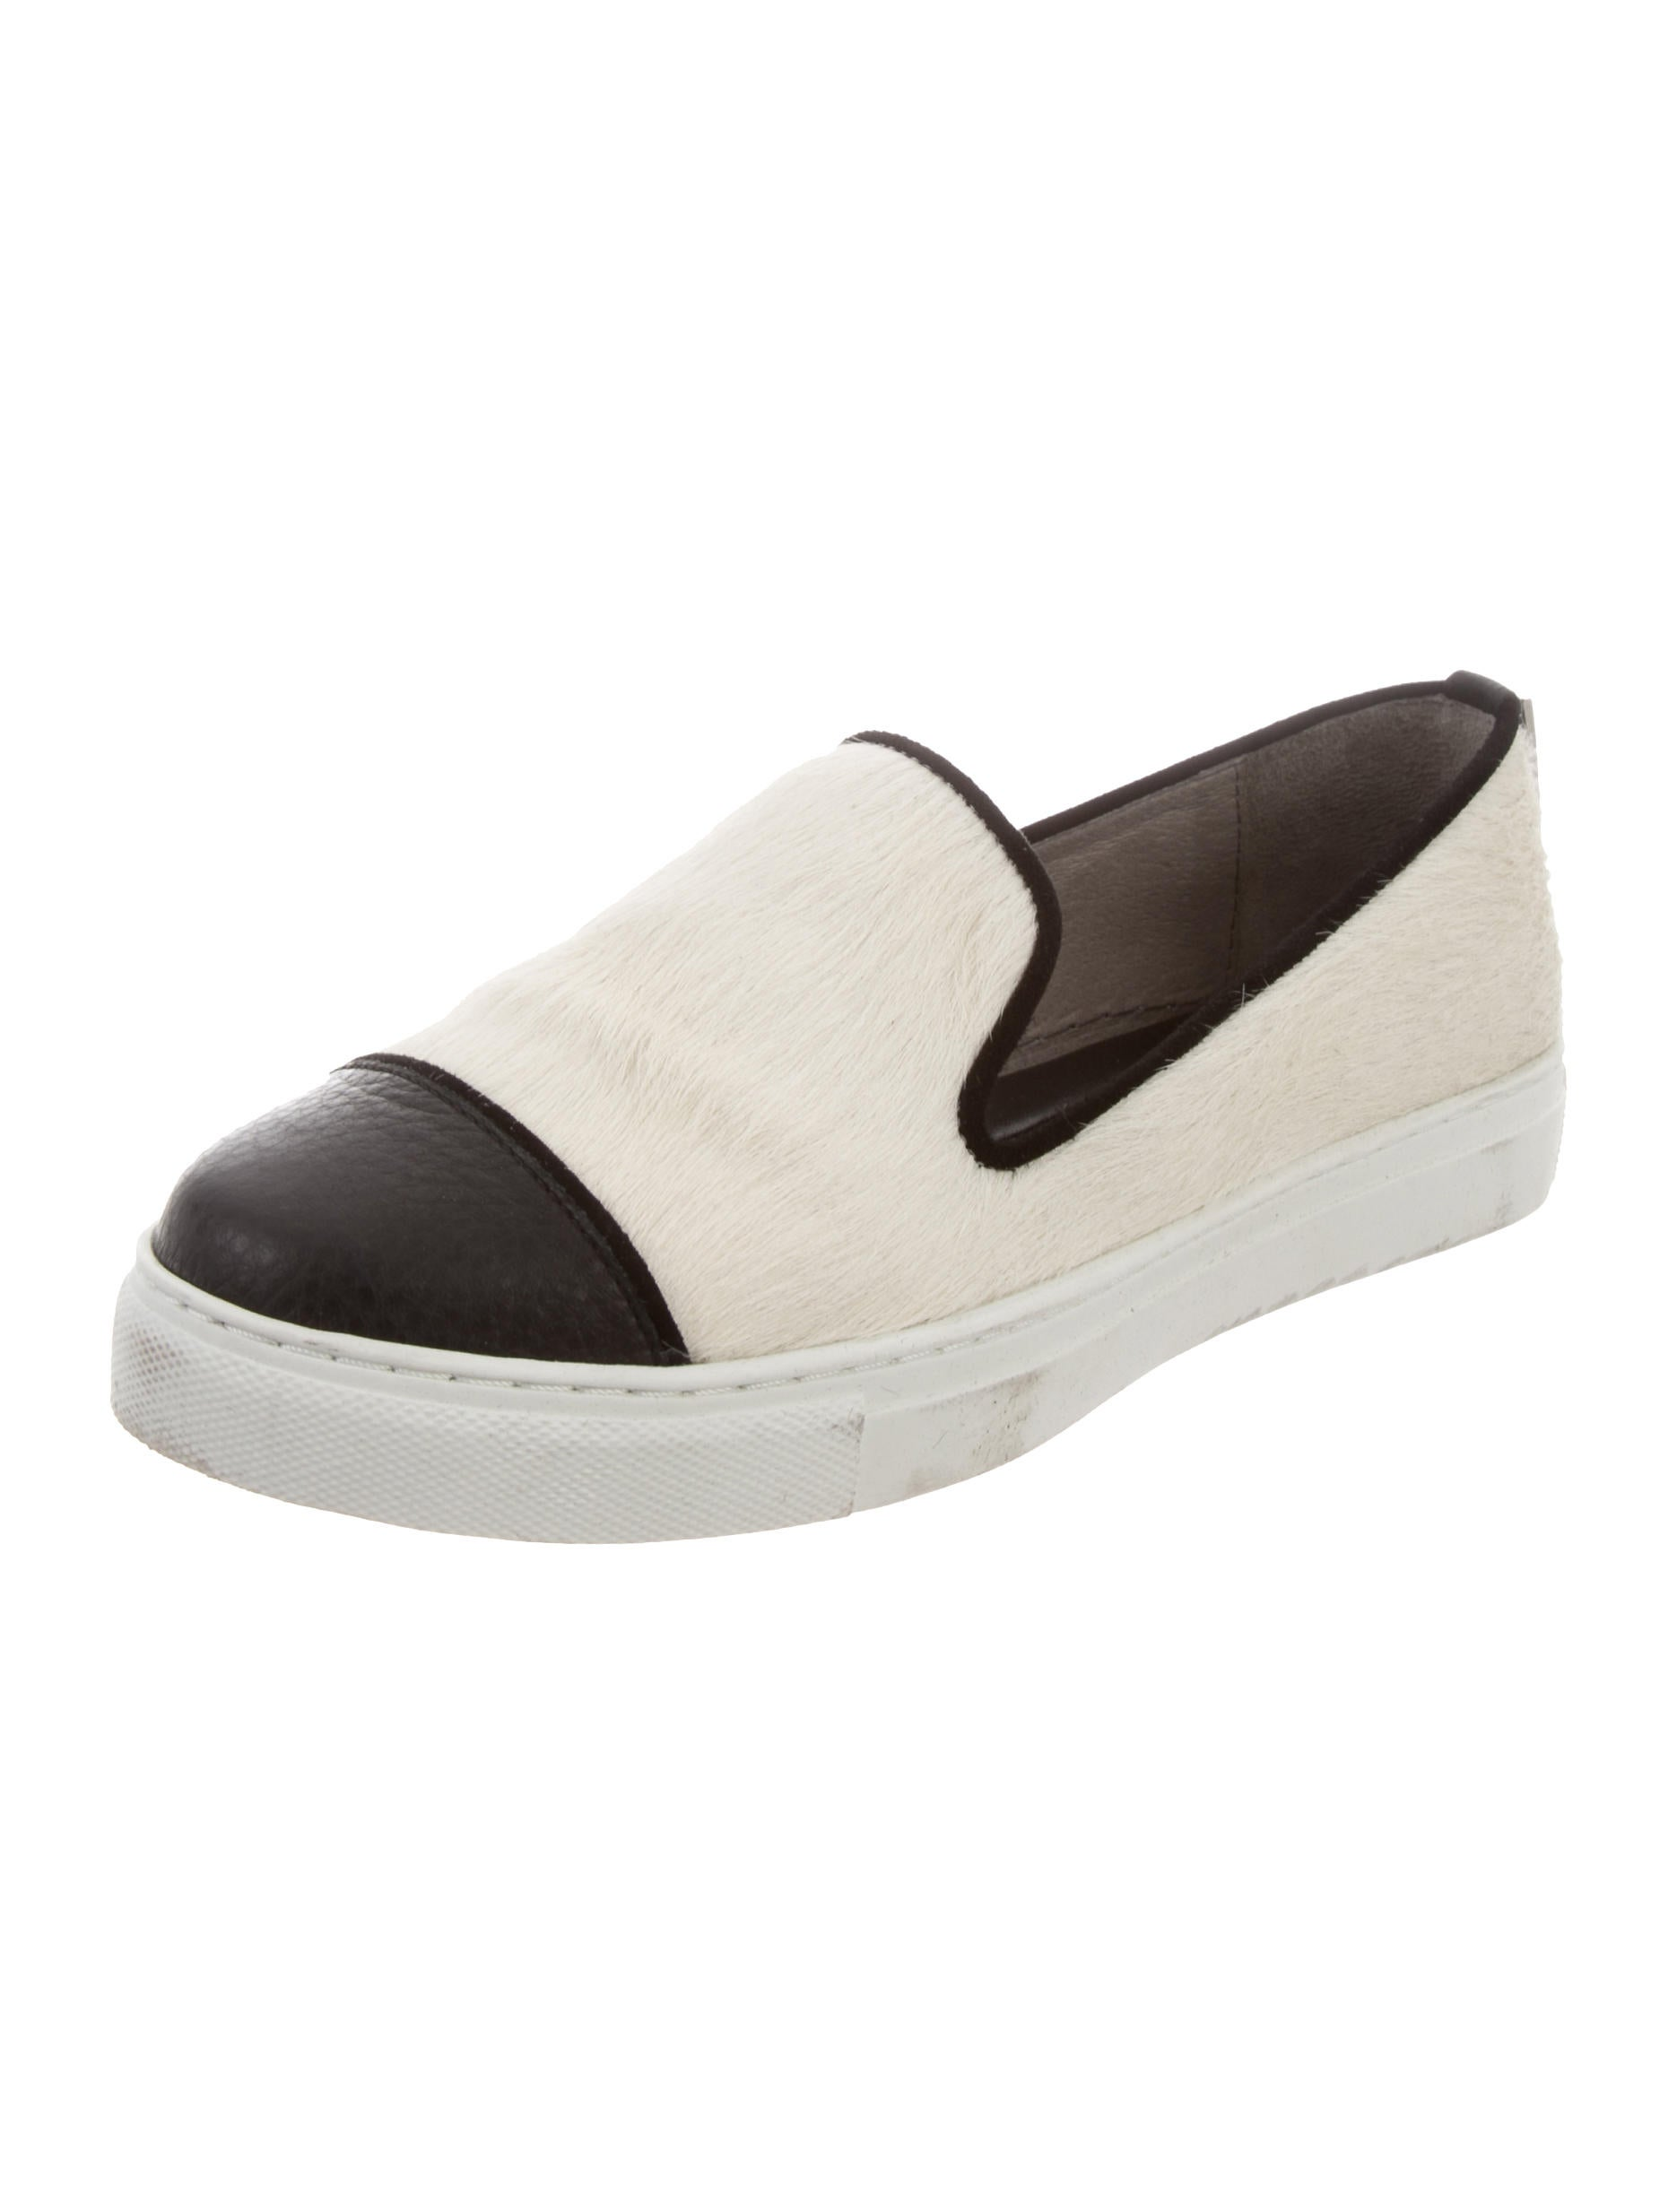 Mara & Mine Nolita Ponyhair Slip-On Sneakers browse cheap price best wholesale sale online sUICd